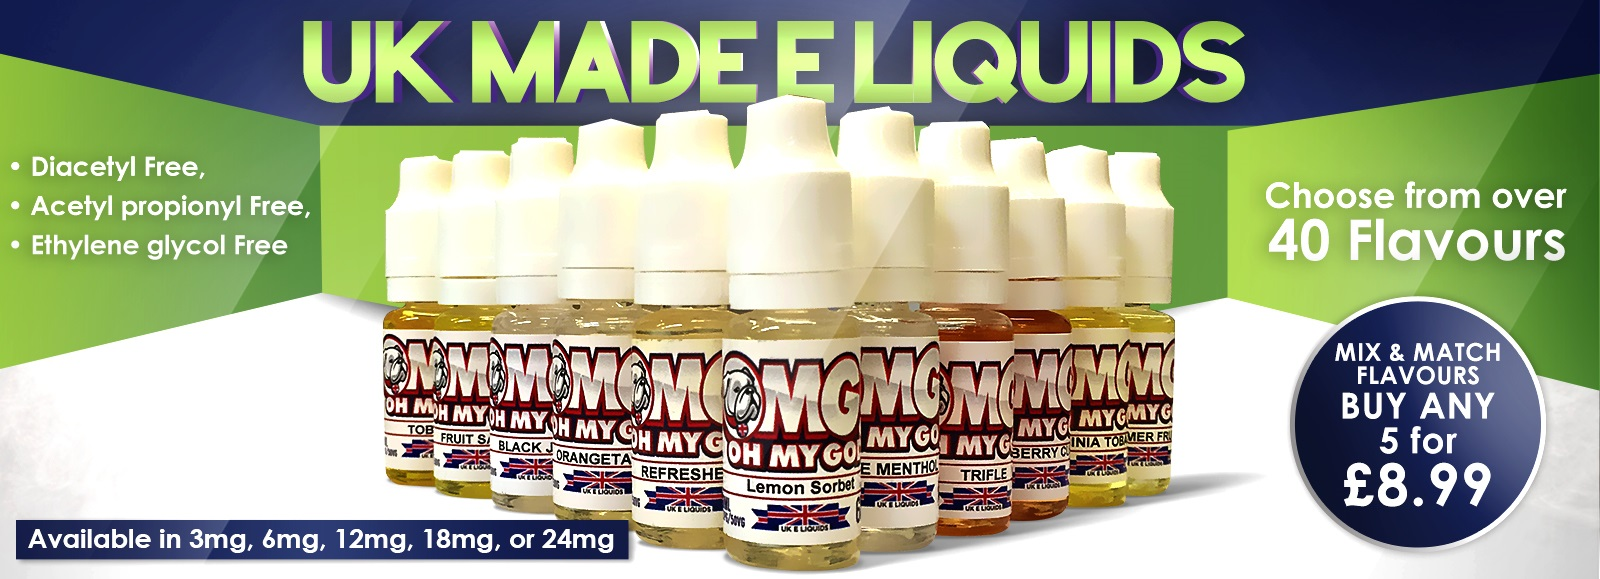 Cheap Uk Made E Liquid Juices Refills From 1 89p In 500 Mlk Bar 60ml Eliquid Vape Banana Choco Nut Premium Flavours